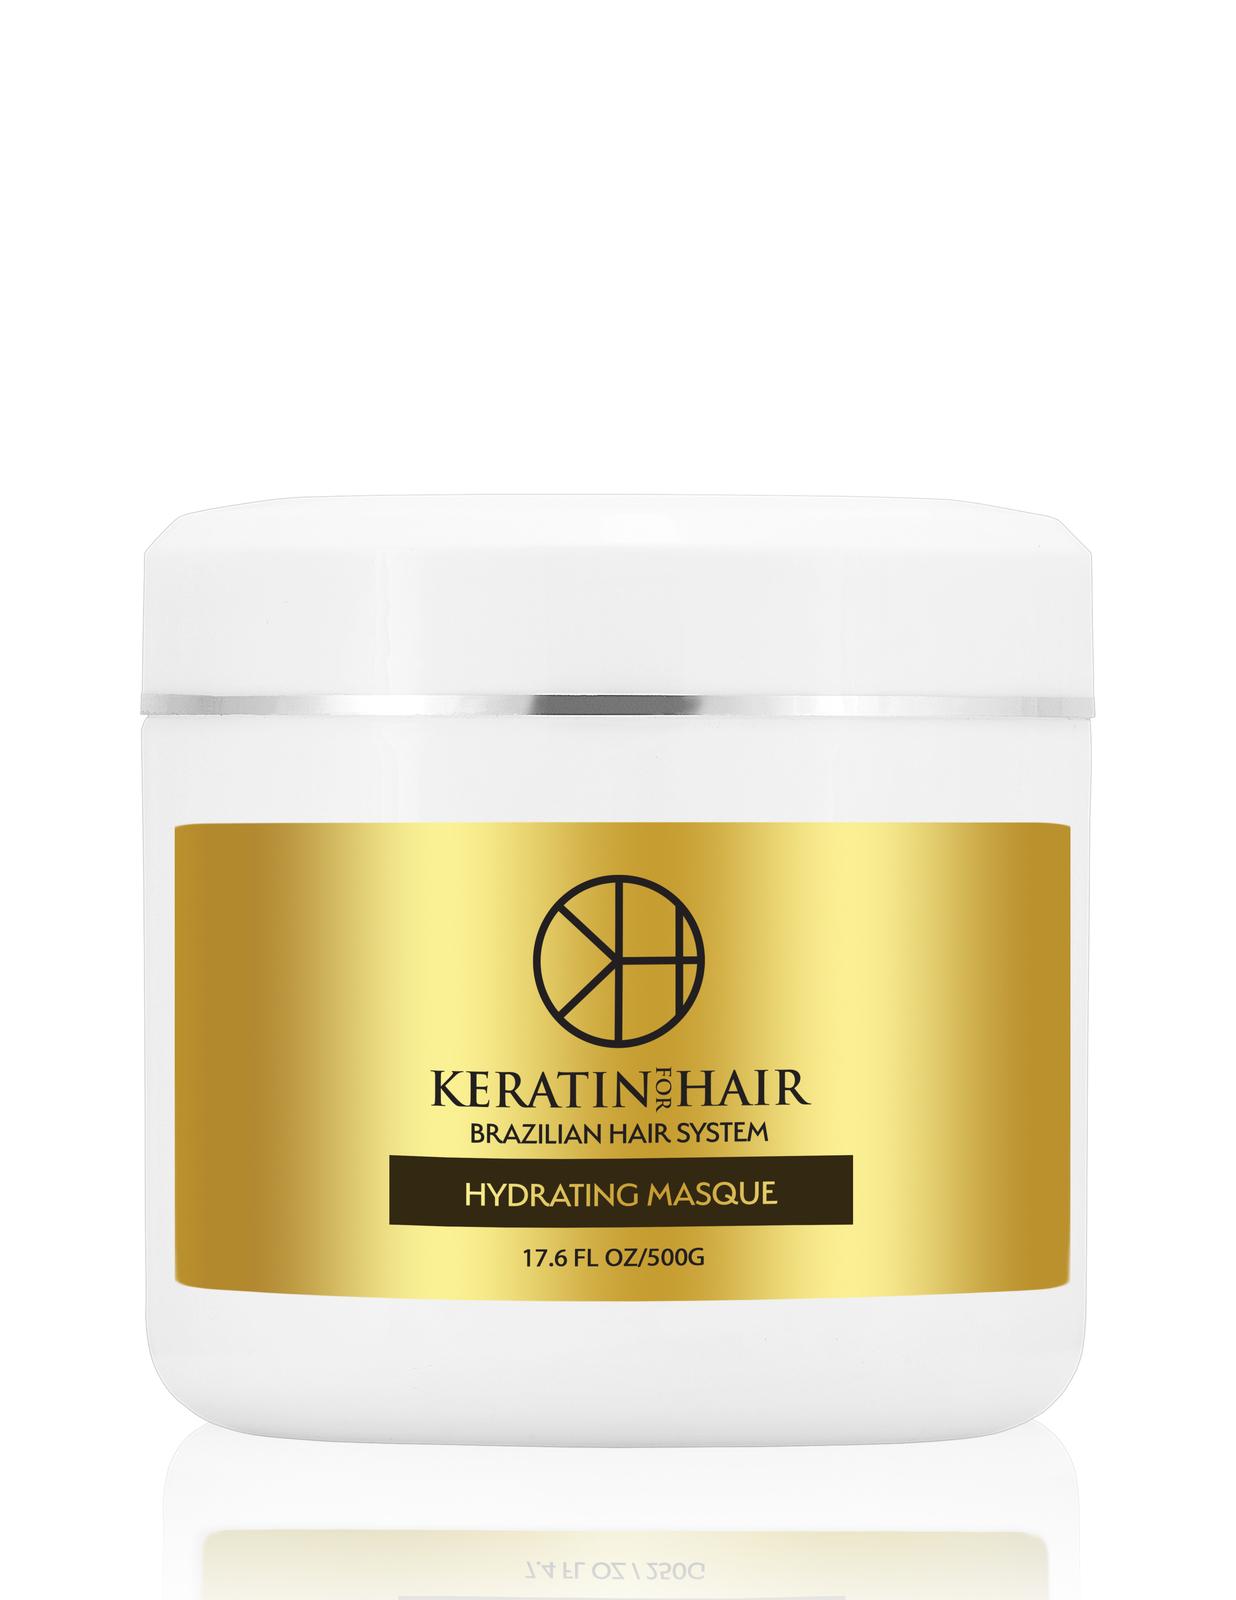 Keratin For Hair Hydrating Hair Masque Mask Deep Repair Conditioning 17 oz